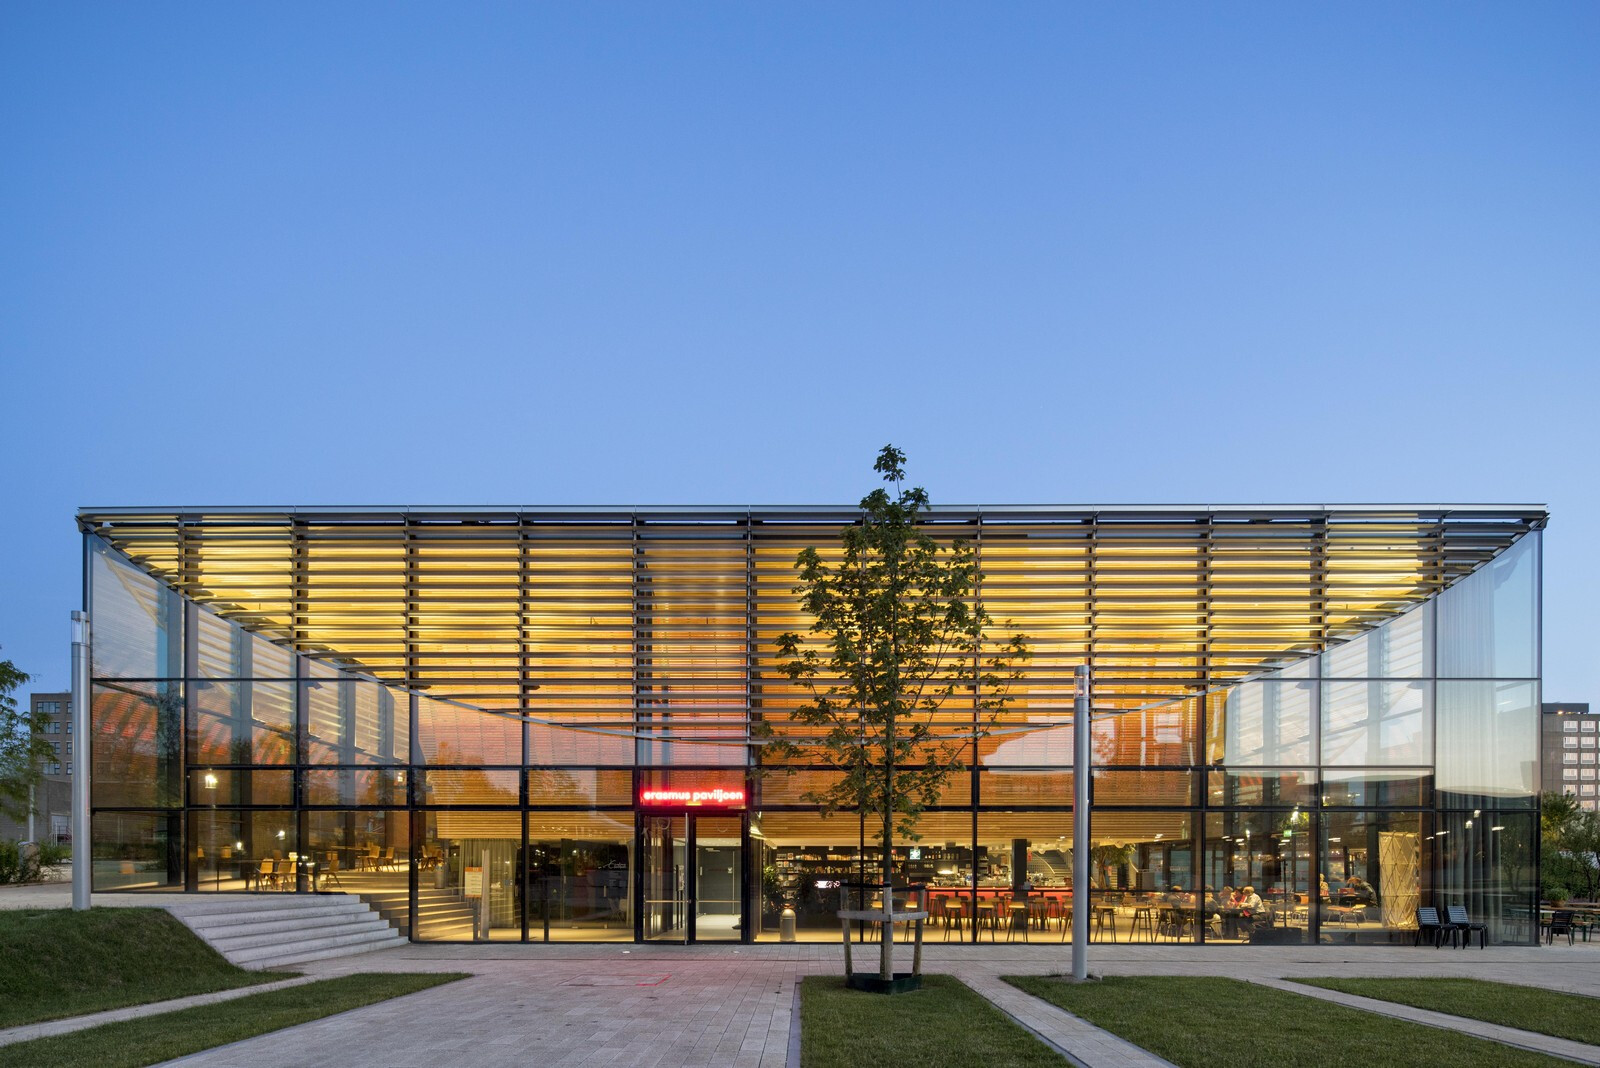 Rotterdam Erasmus Pavilion